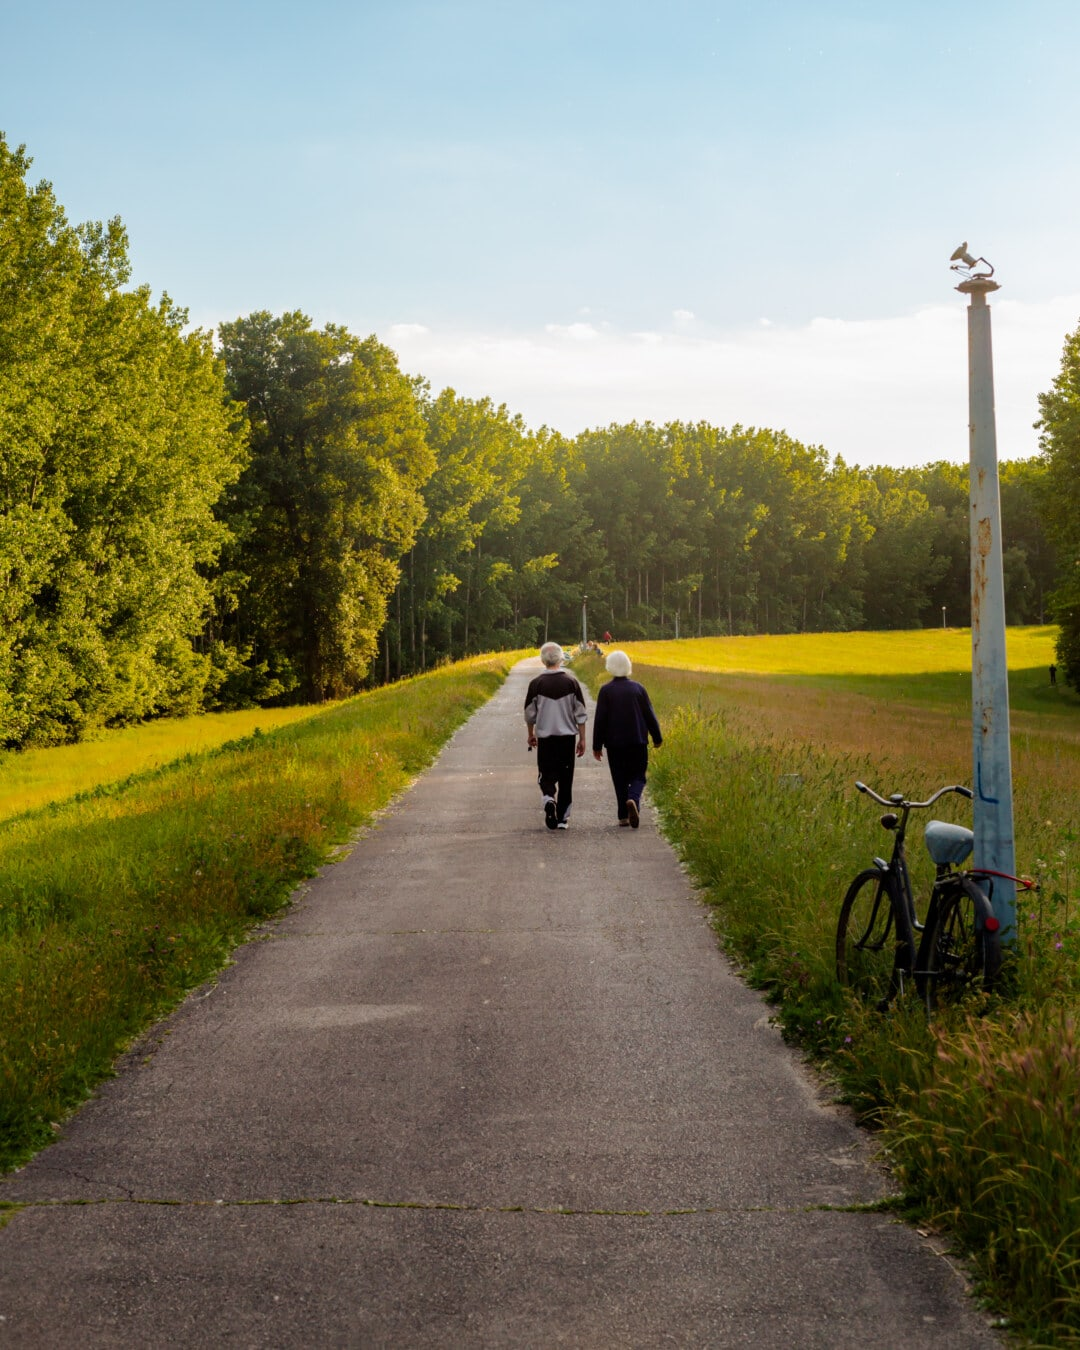 Rentner, ältere Menschen, Mann, Erholung, Frau, Straße, Fuß, Asphalt, Landschaft, Moped